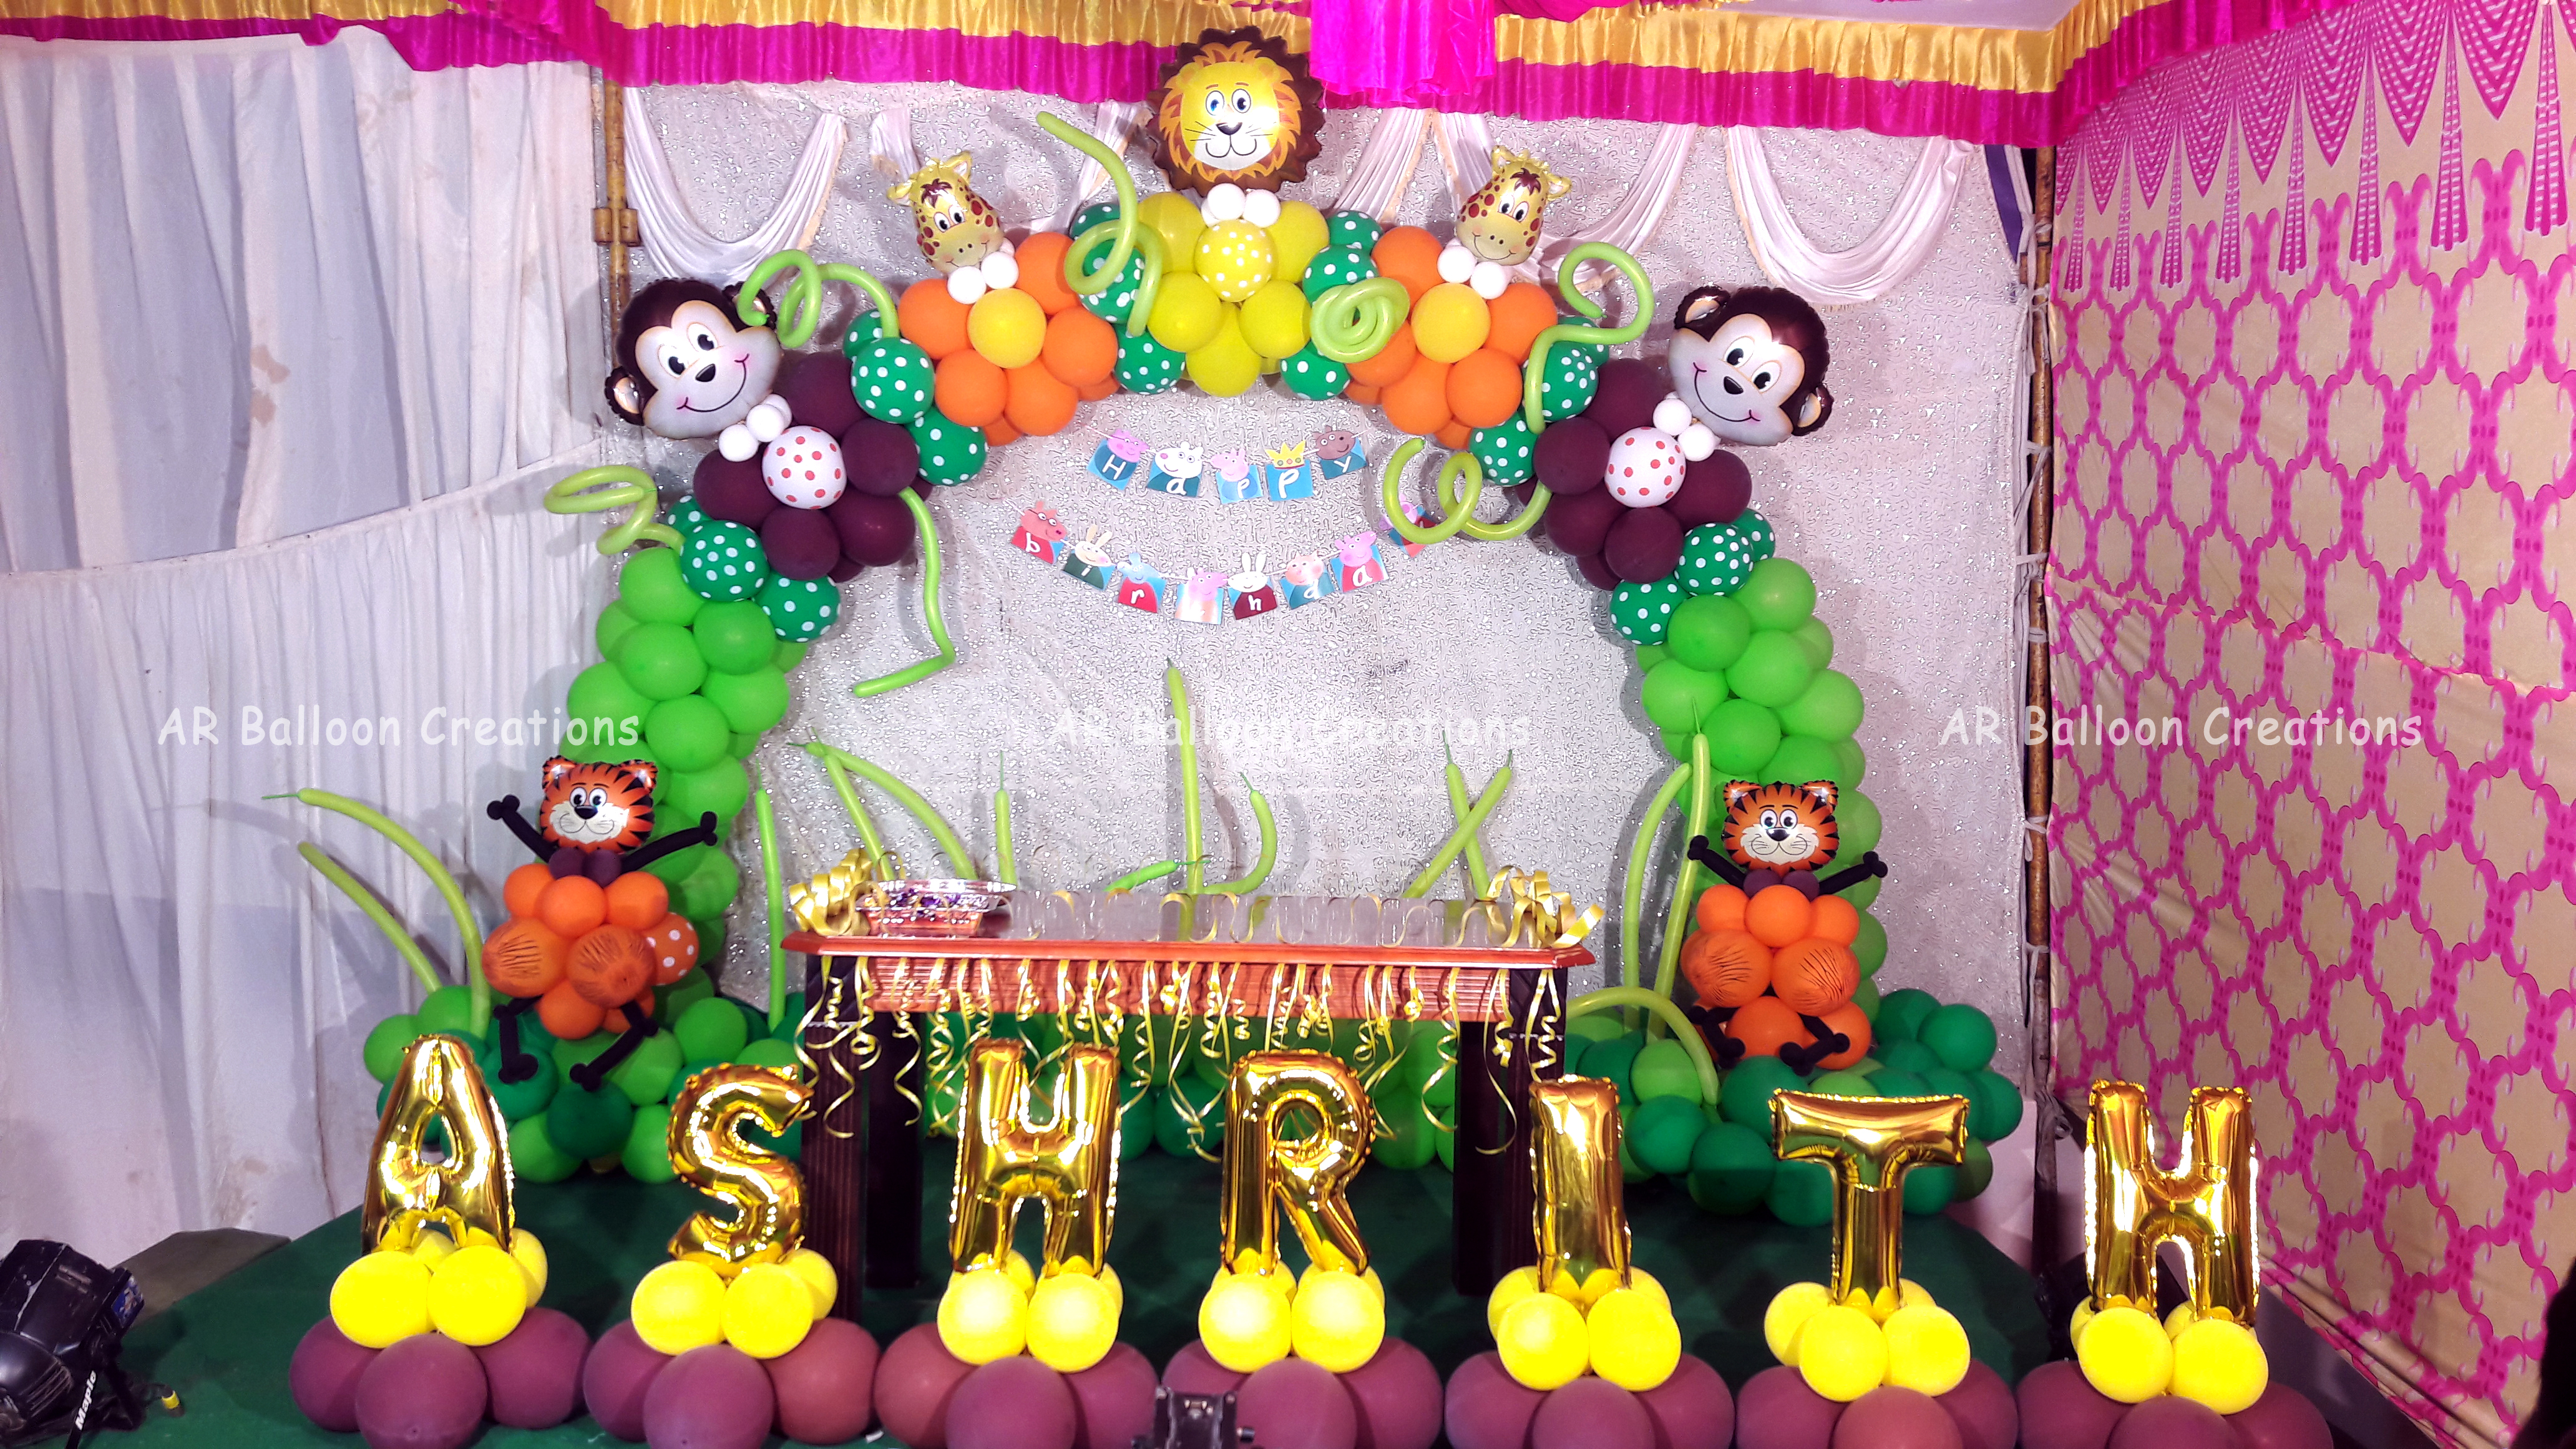 ASHRITH 1st Birthday